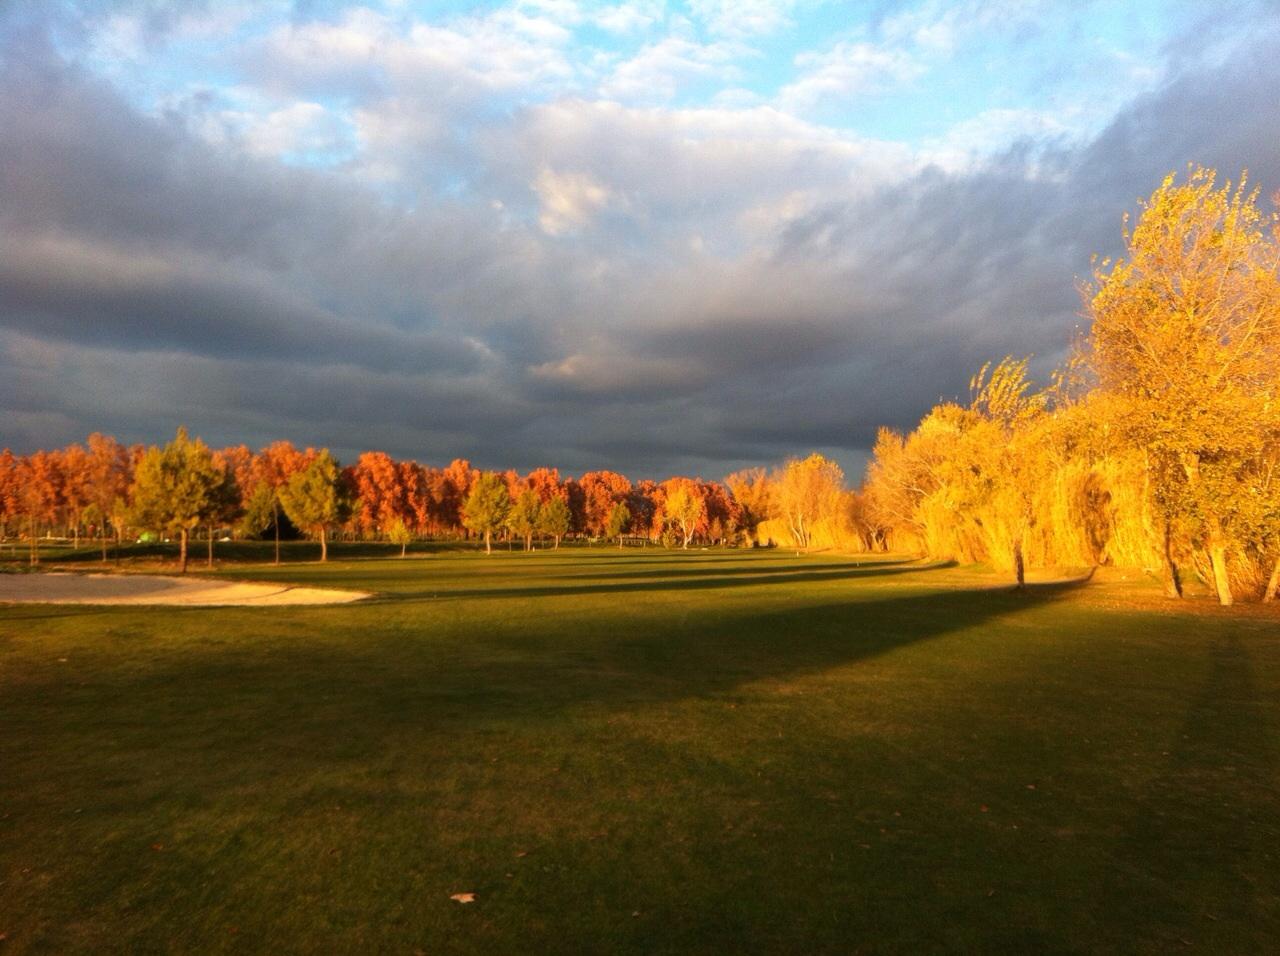 otono-club-de-golf-aranjuez-2